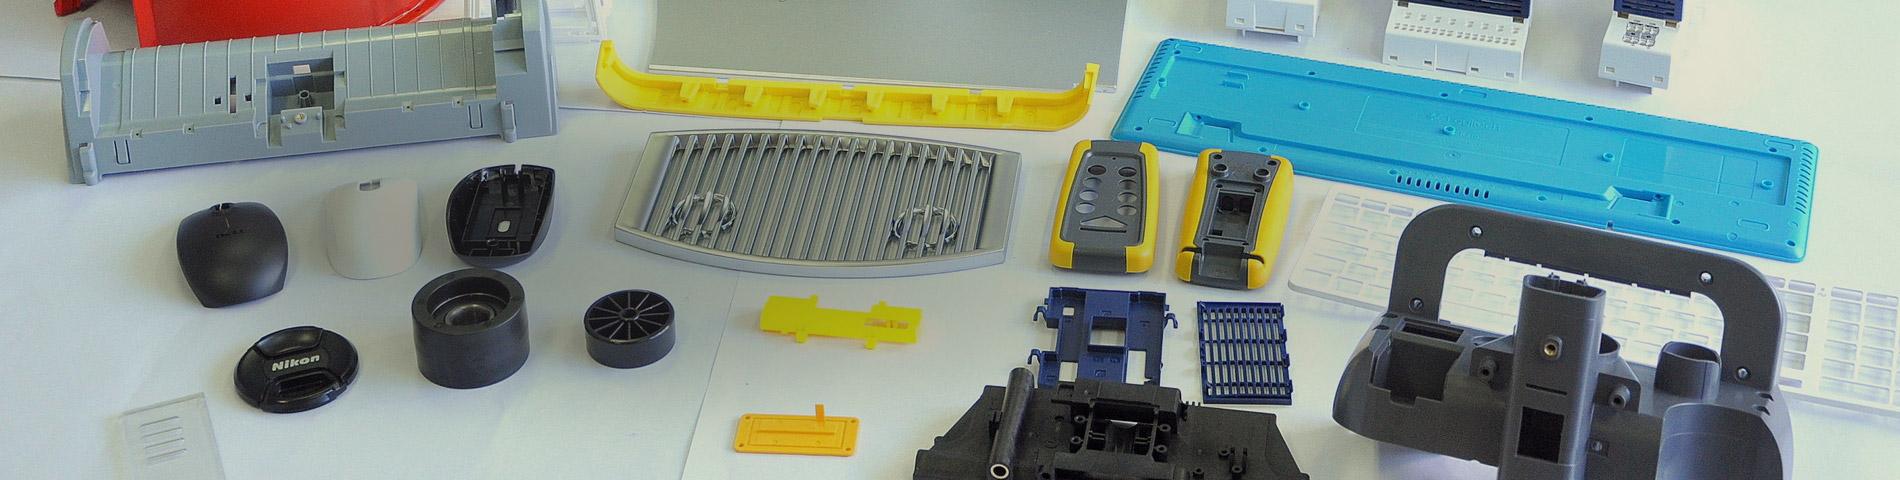 TERA provide plastic, rubber and silicon product since 1998